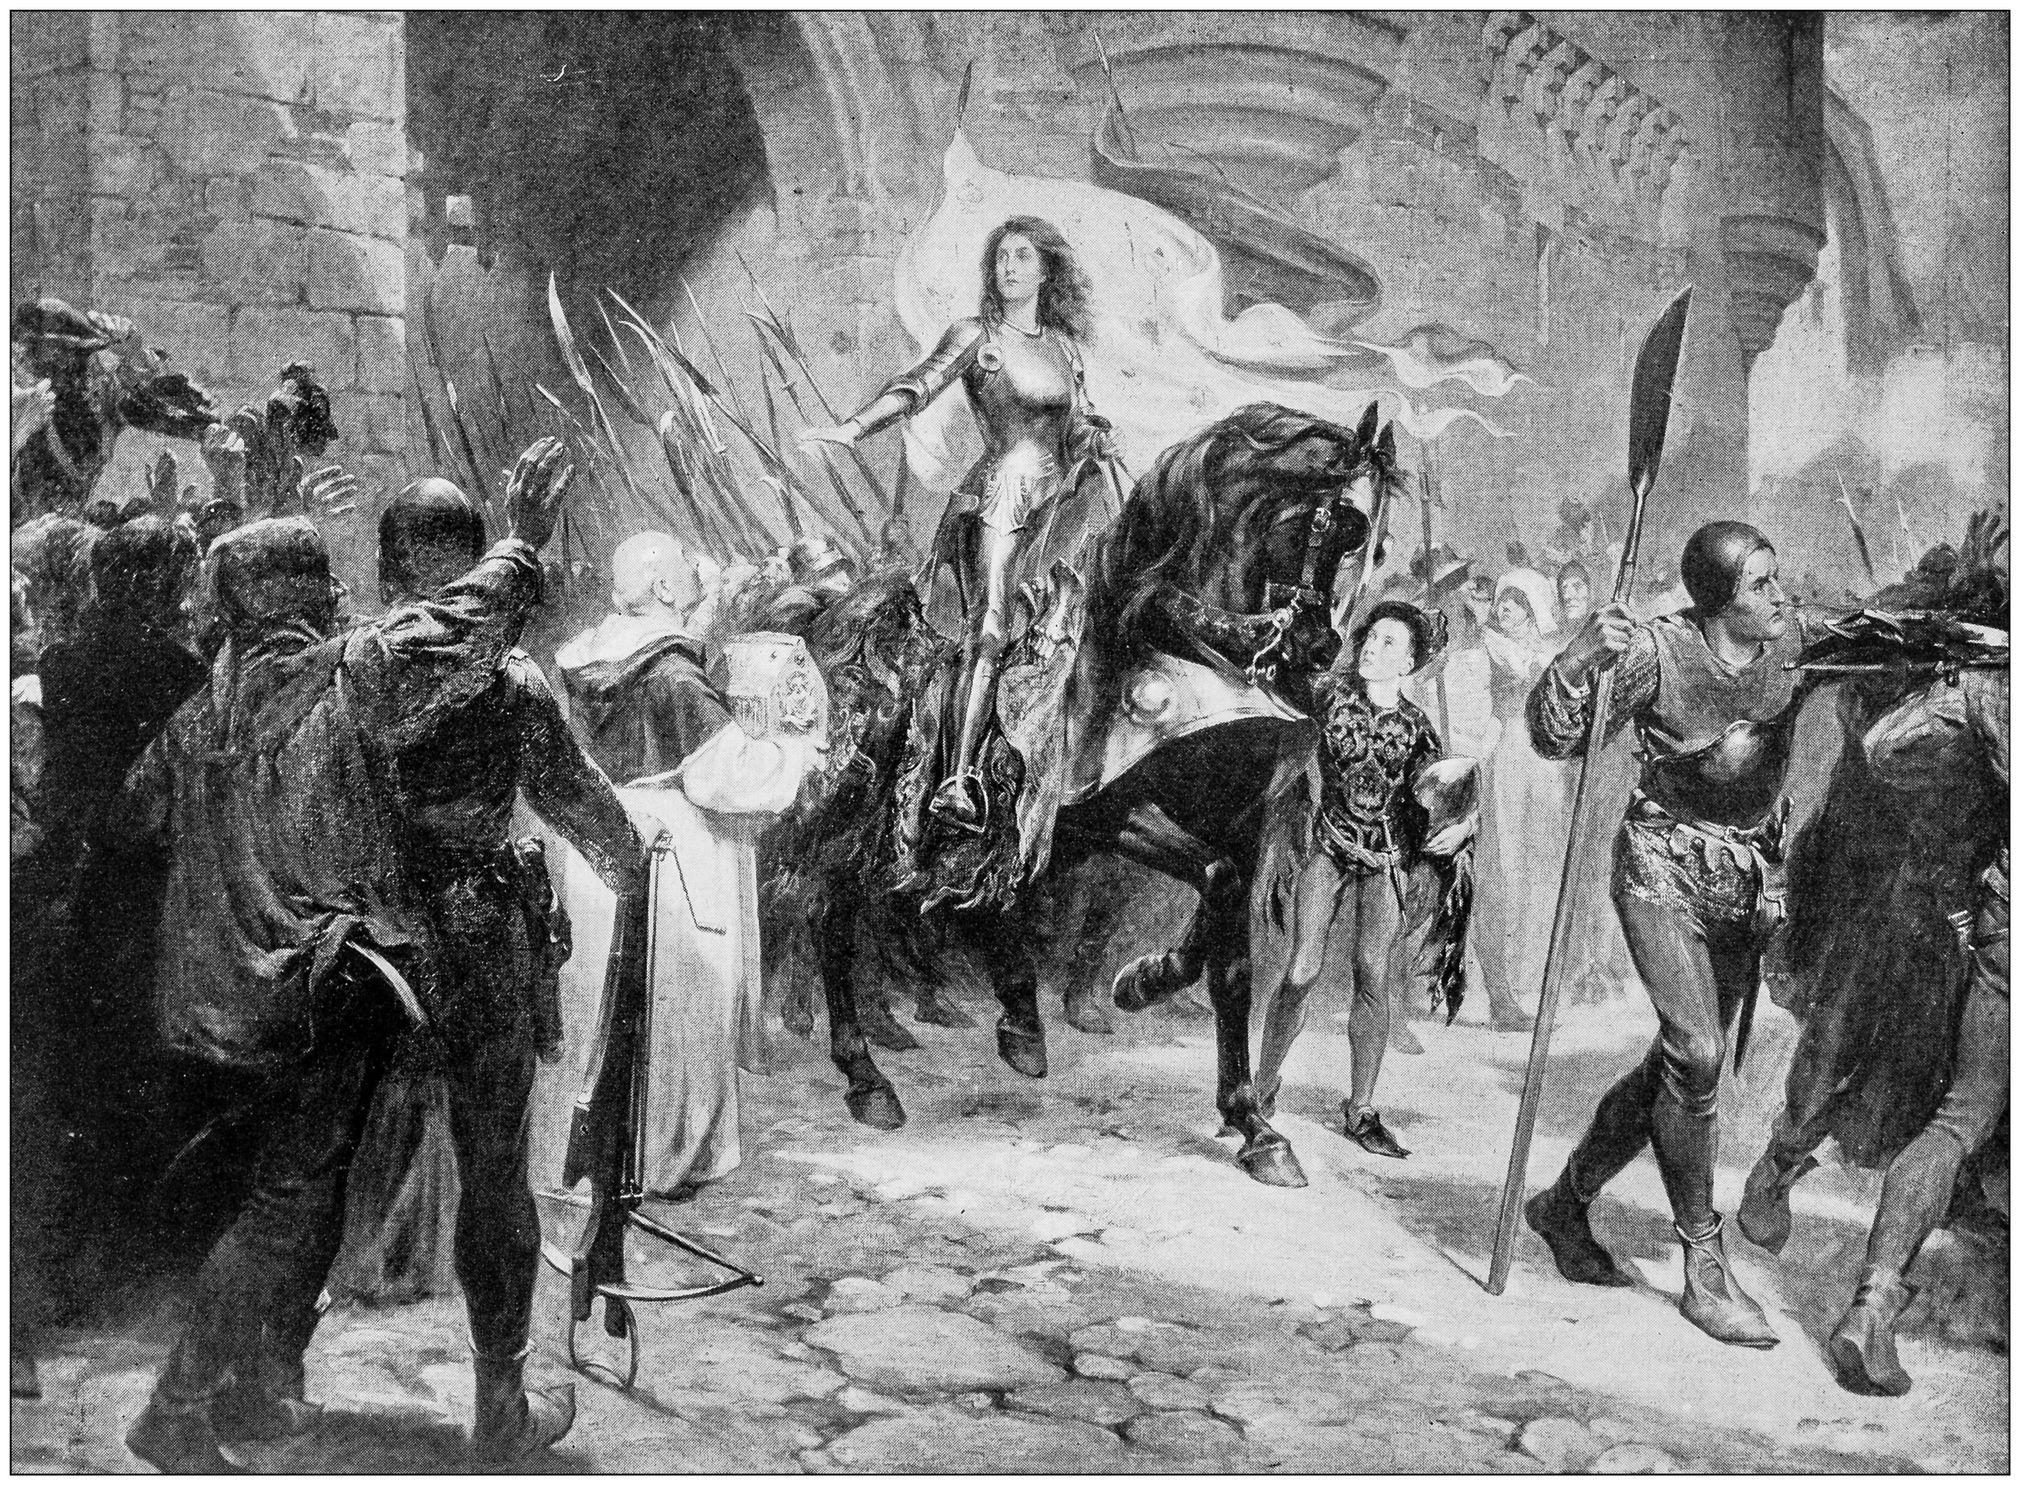 Christian Mysticism Through History